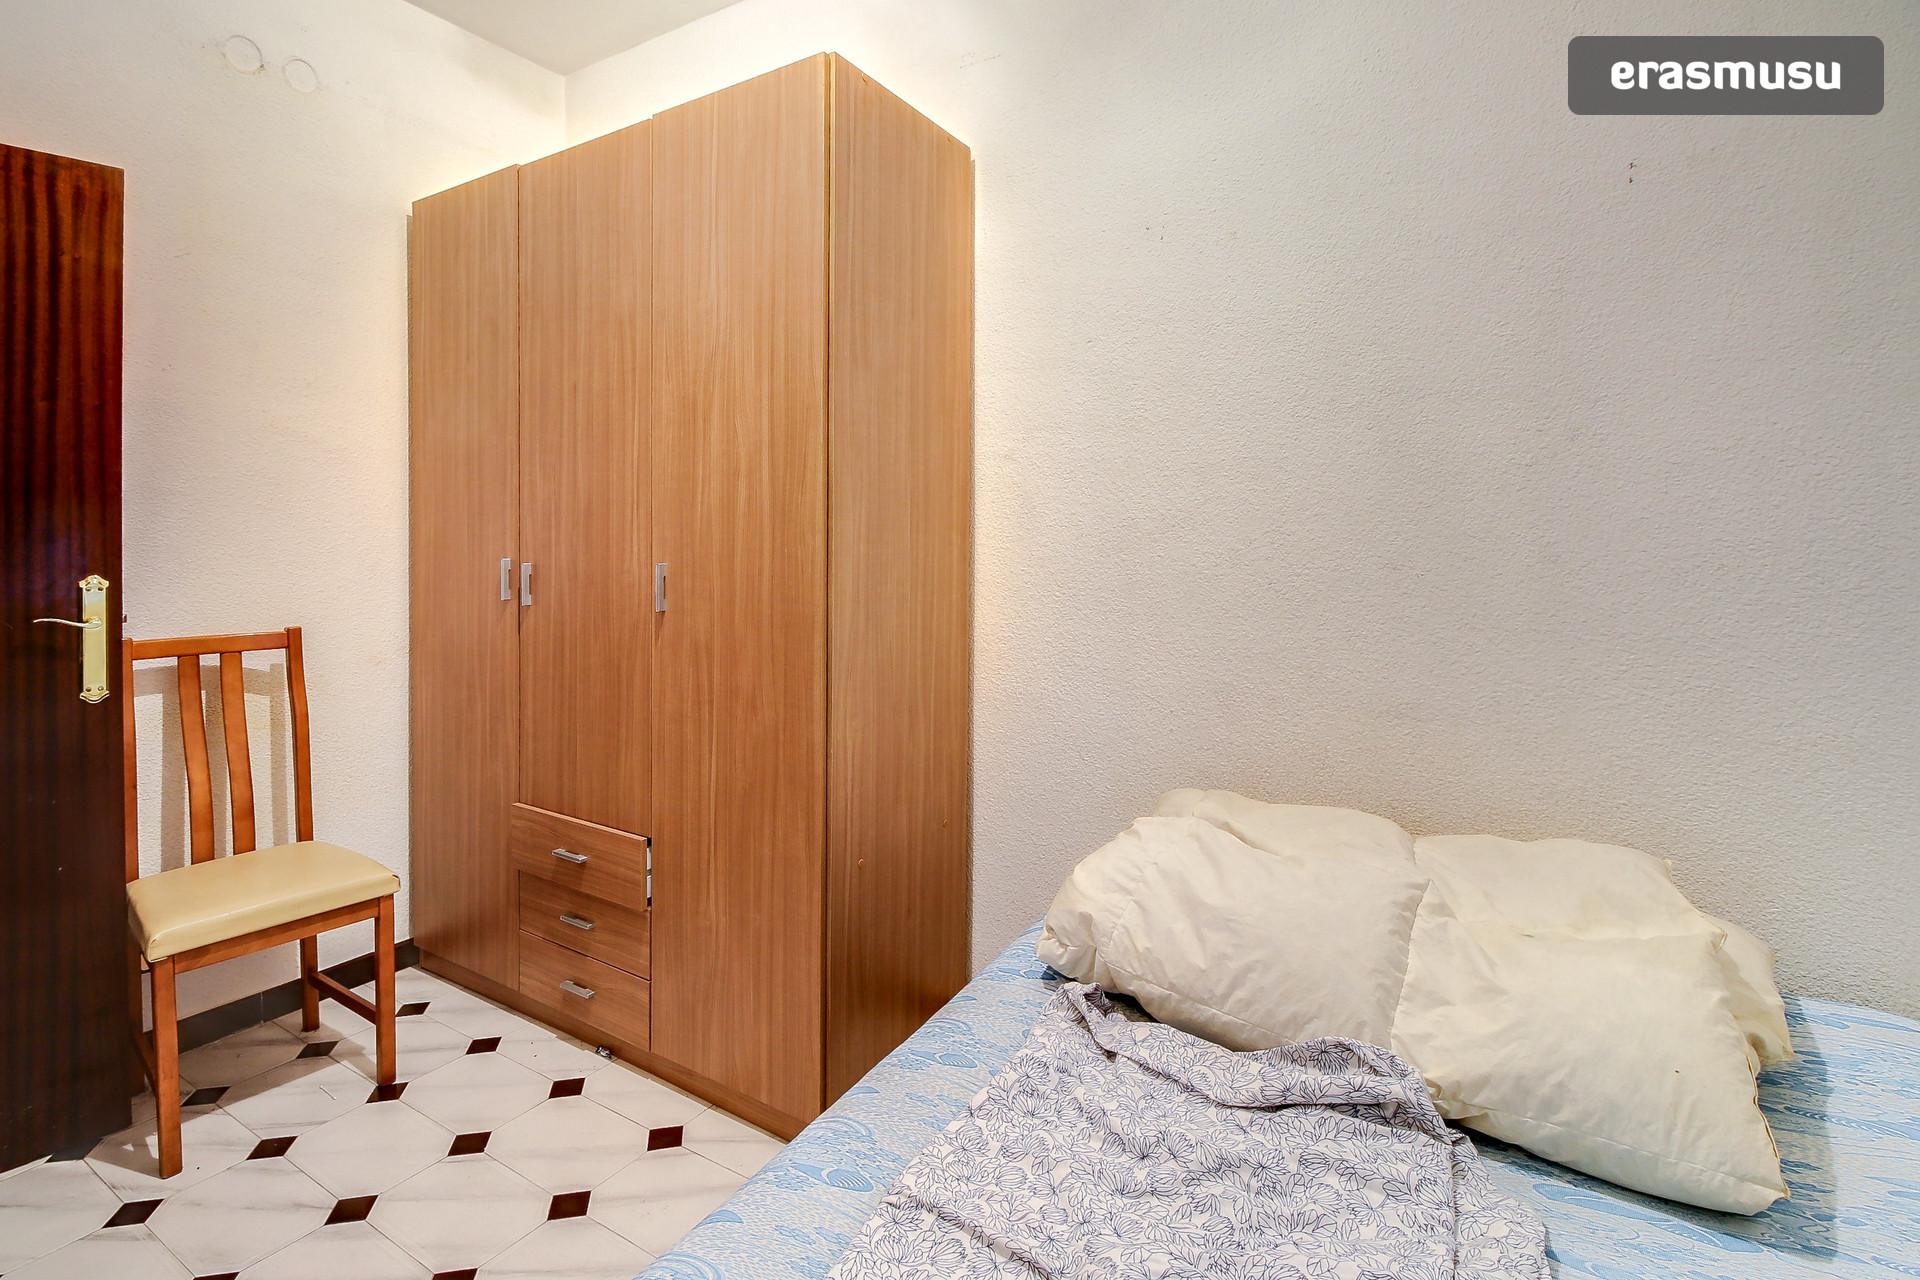 habitacion-chollo-barcelona-71b20c713e67